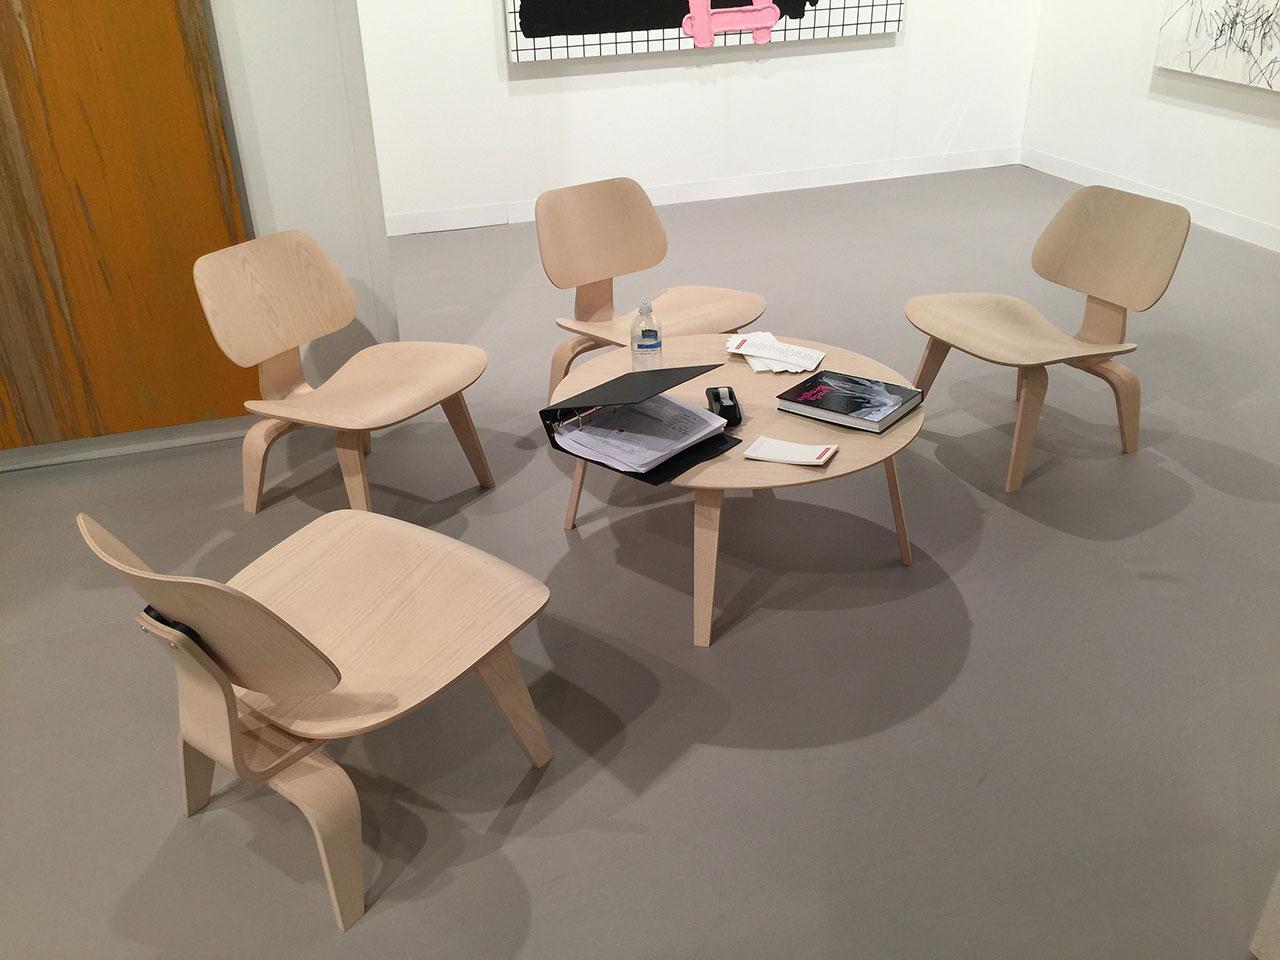 Eames chairs at Cheim & Read